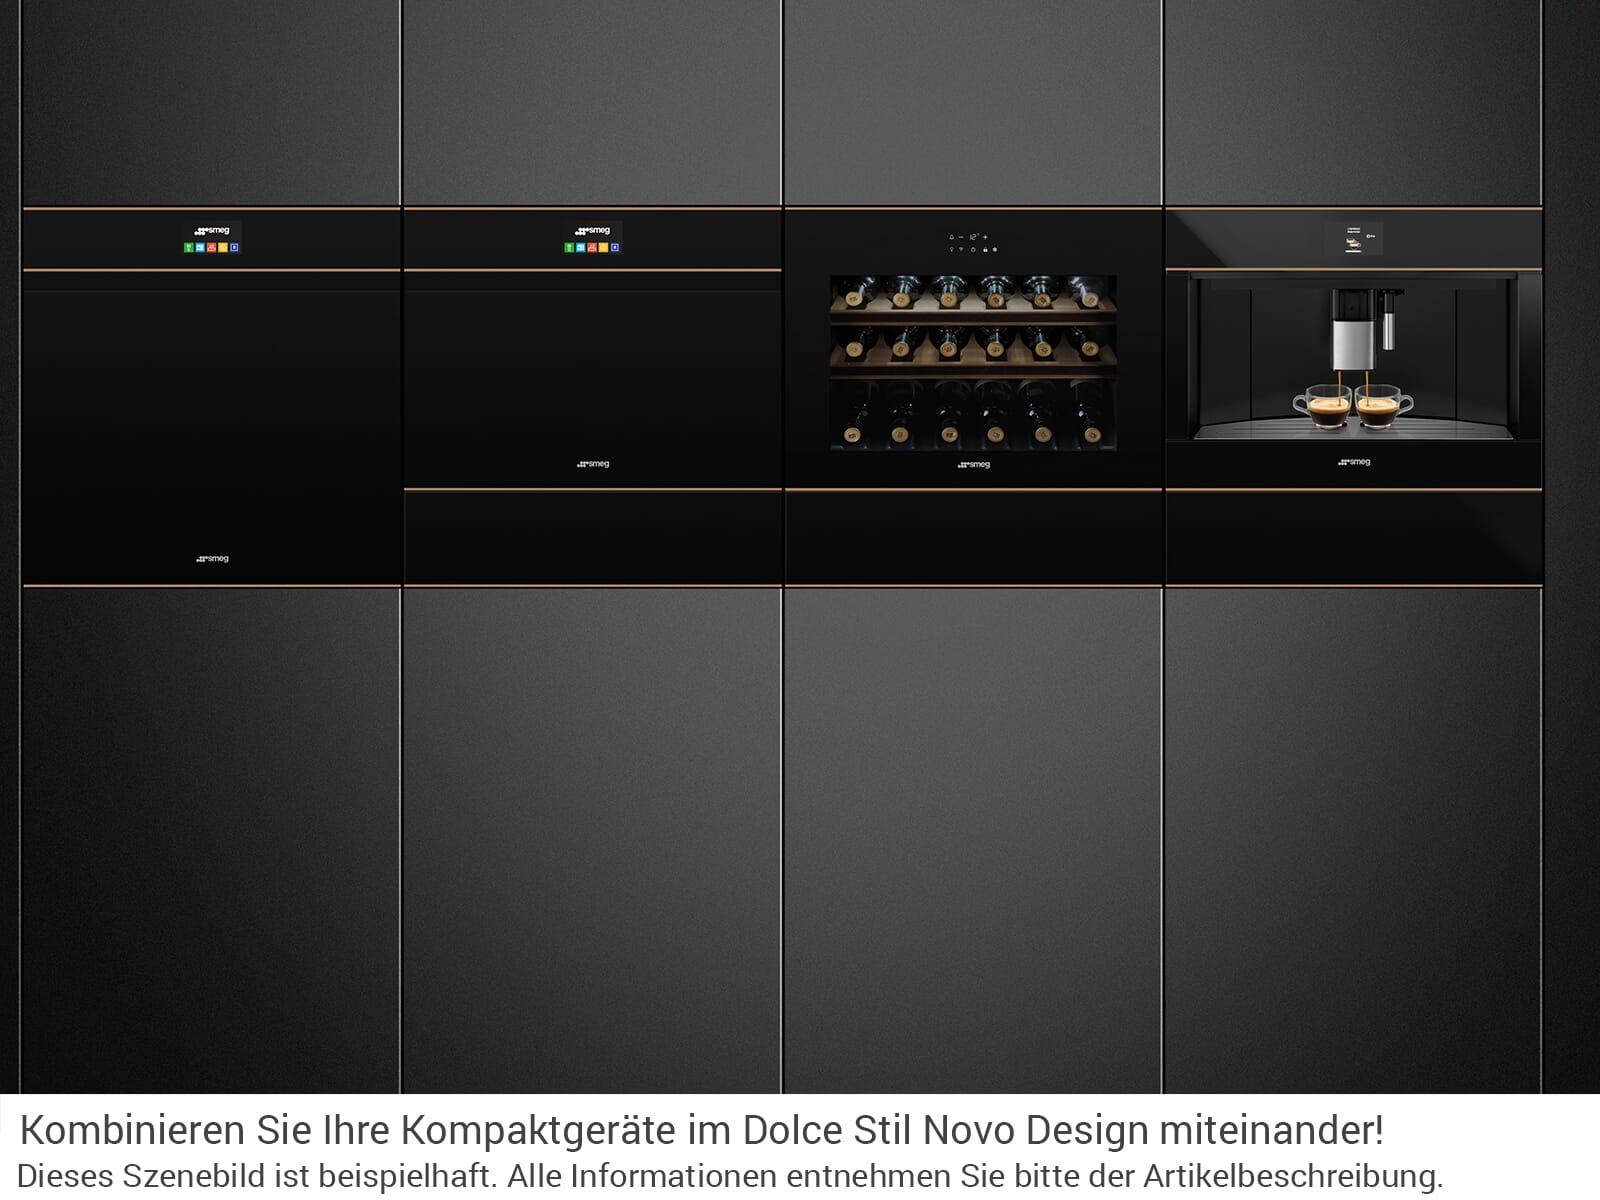 Smeg CMS4604NR Einbau-Espresso-/Kaffeevollautomat Schwarzglas/Kupfer